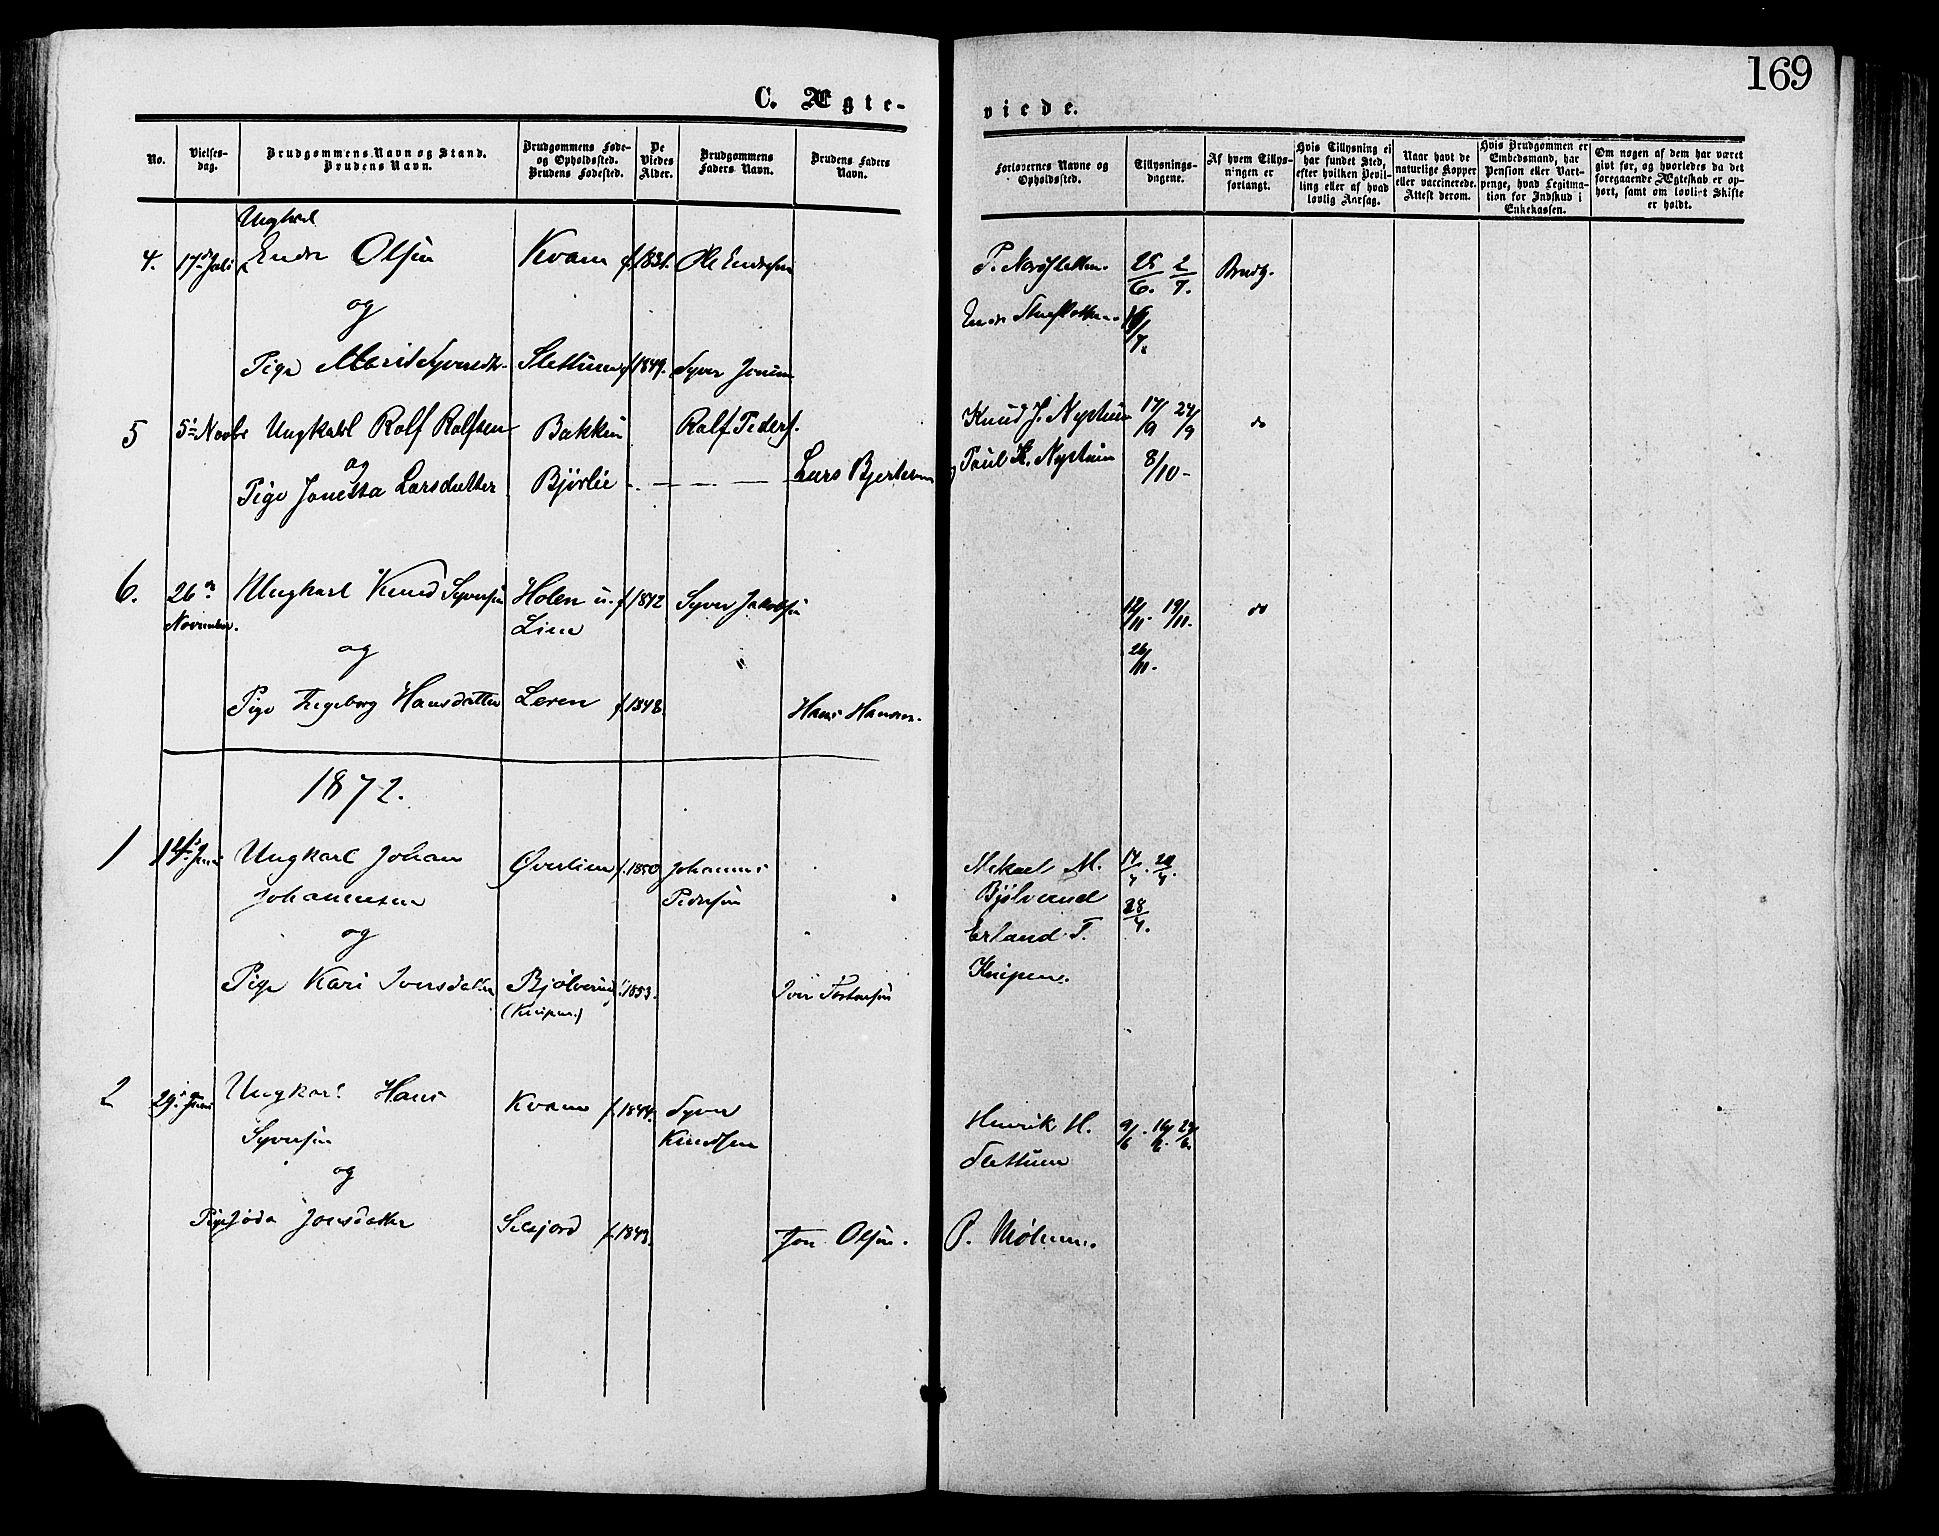 SAH, Lesja prestekontor, Ministerialbok nr. 9, 1854-1889, s. 169